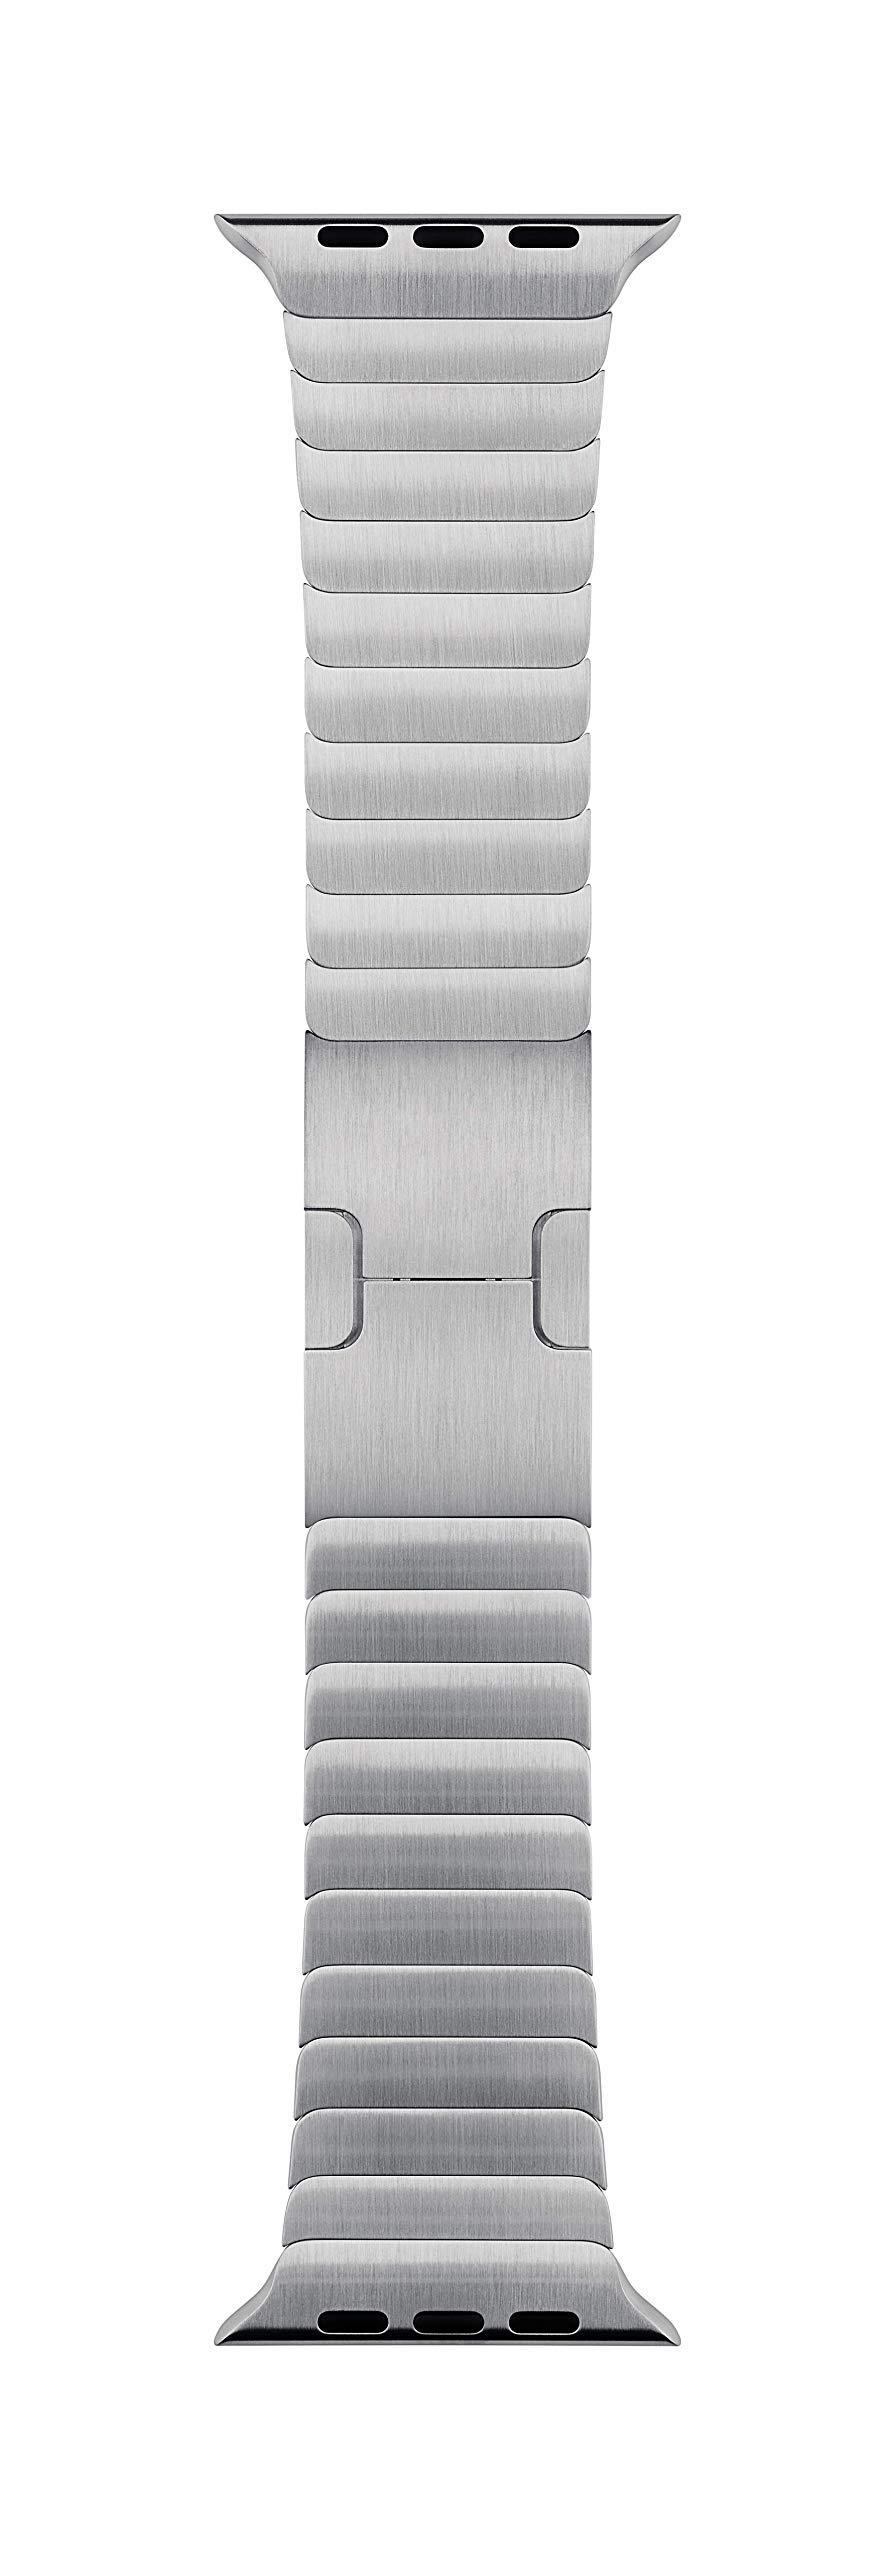 Apple Watch Series 3 Link Bracelet Band (42mm) - Silver